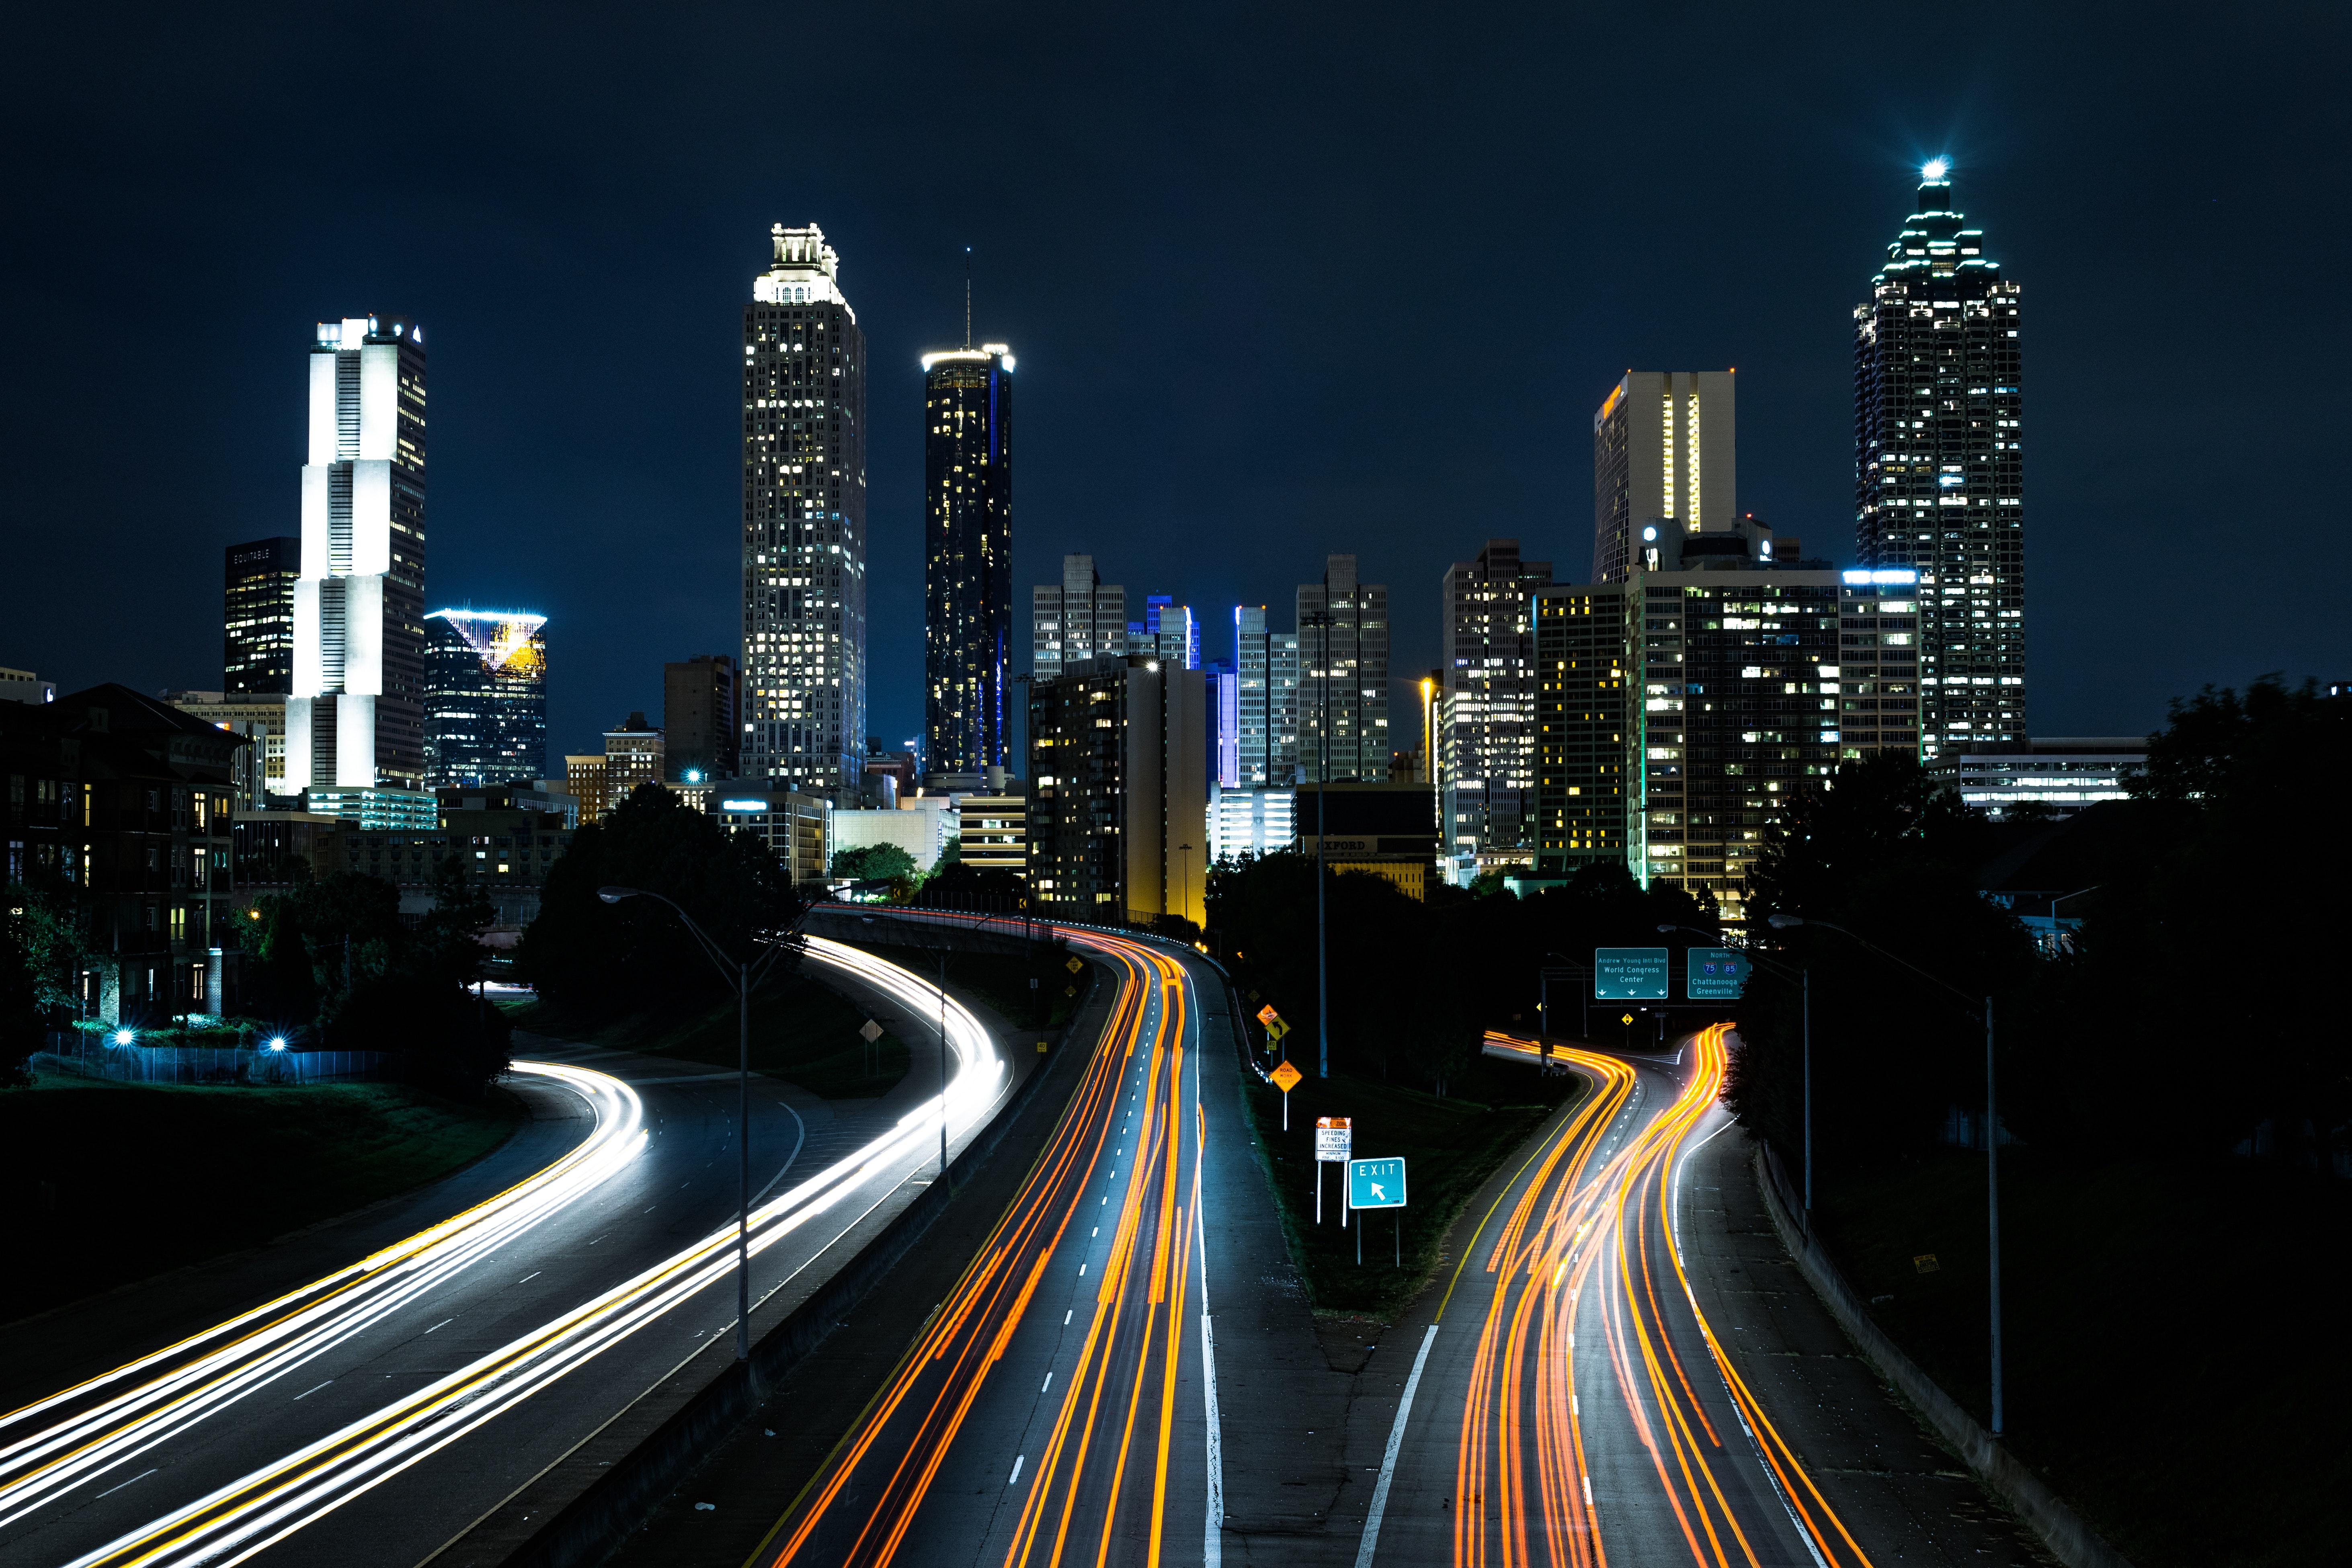 Time Lapse Cars on Fast Motion, Bridge, Long-exposure, Traffic, Time-lapse, HQ Photo